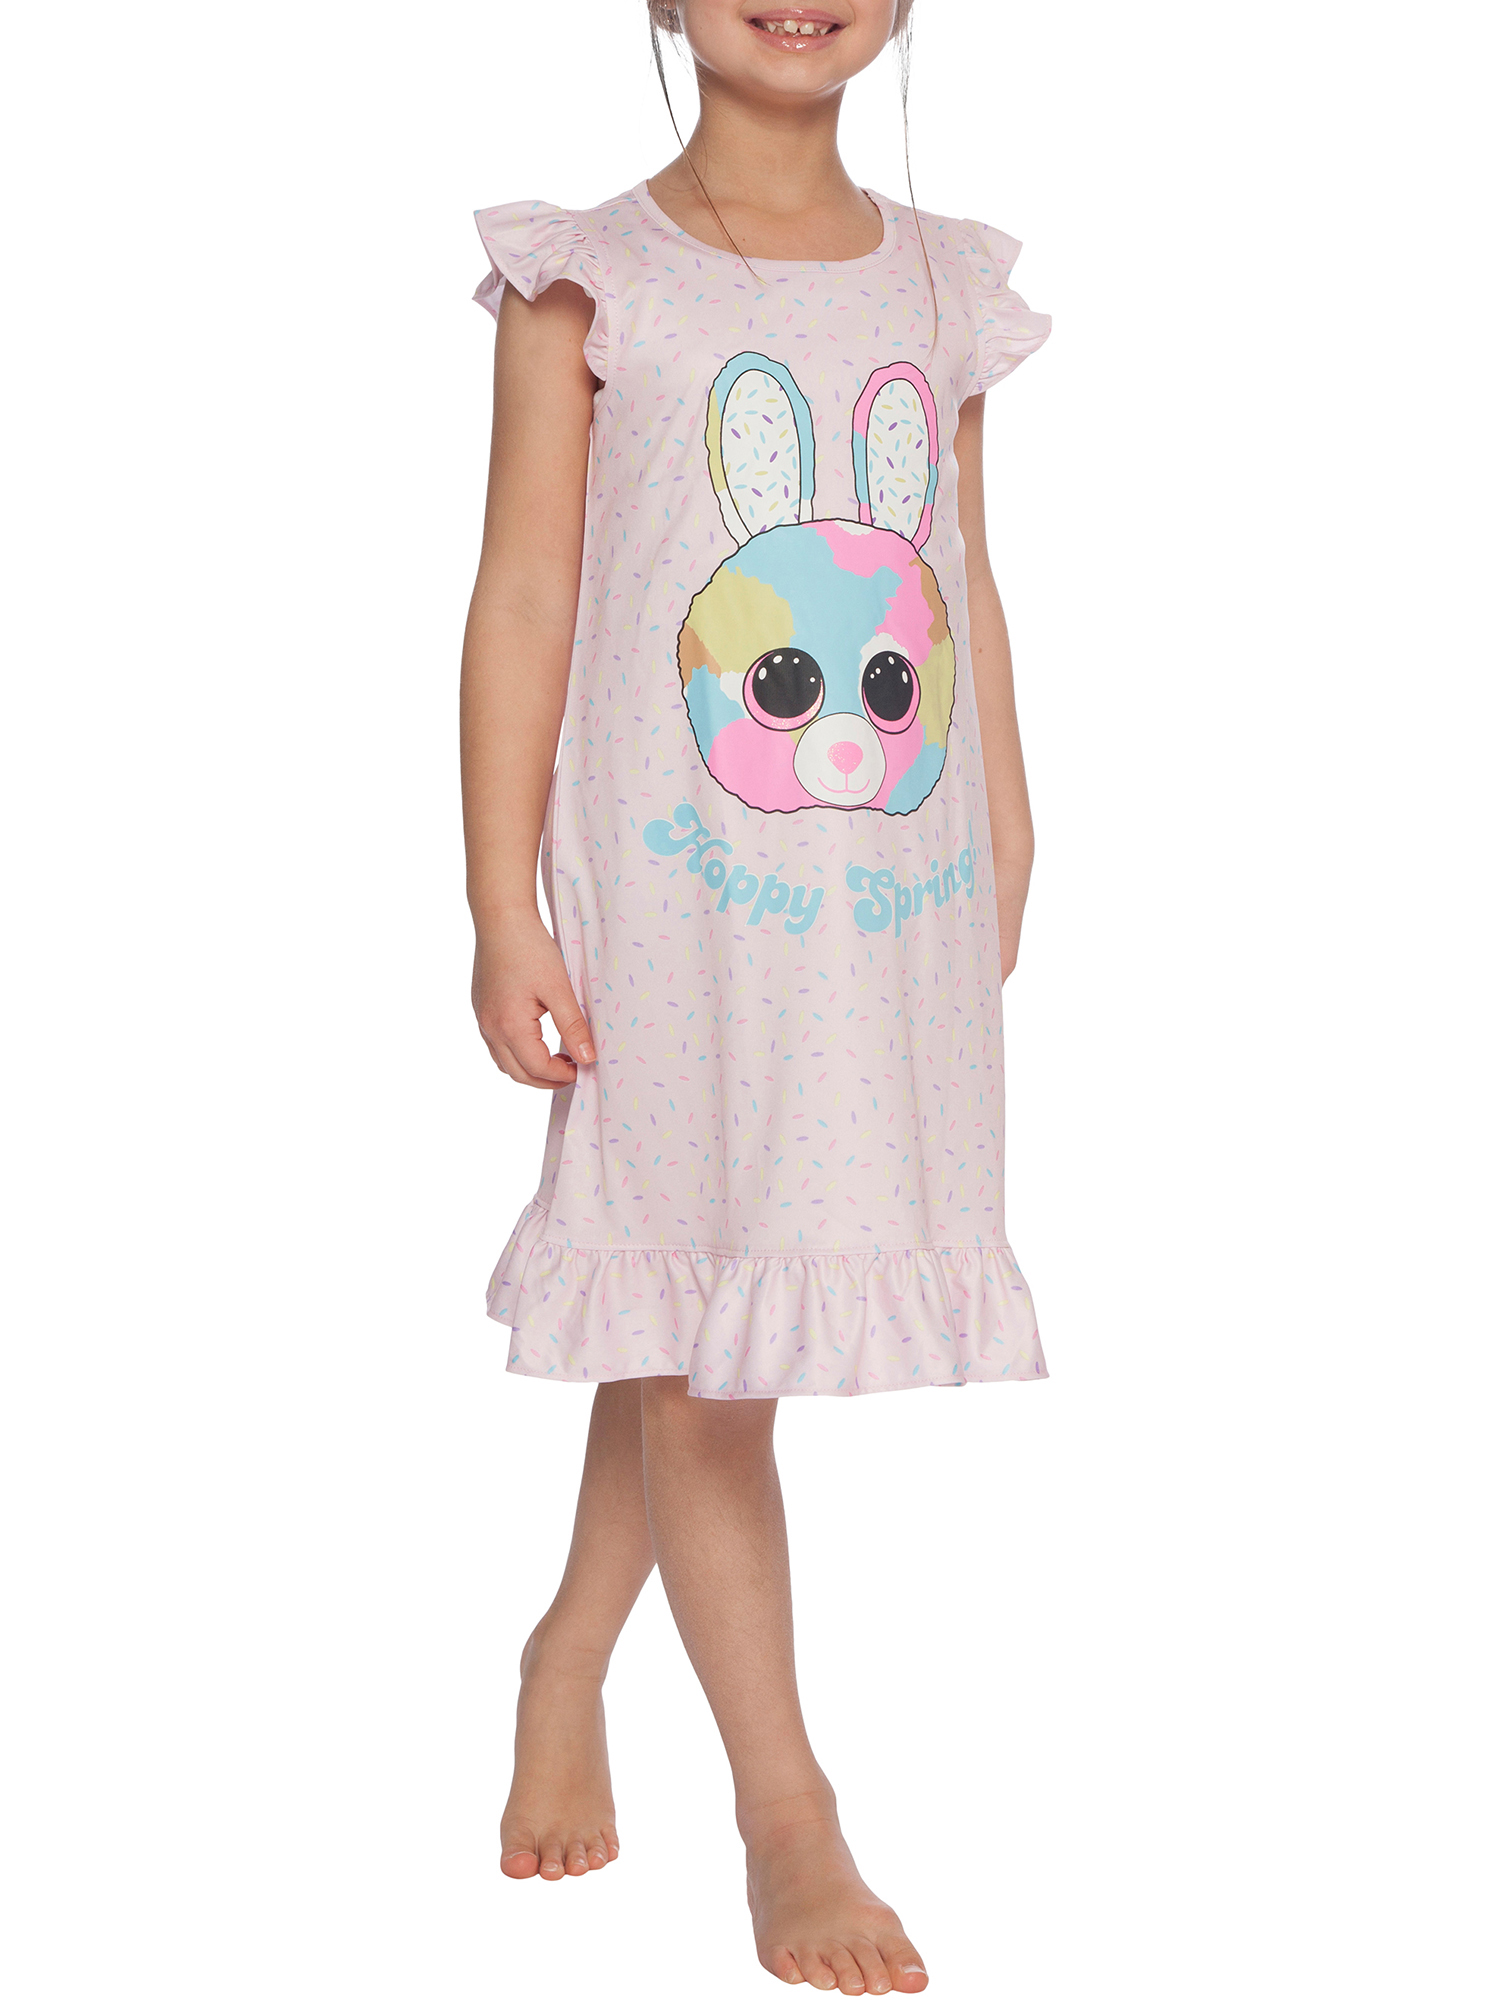 NWT TY Beanie Boo Short Pajamas PJ Set Girls Blue Leona Leopard  4 5 6 7 8 10 12